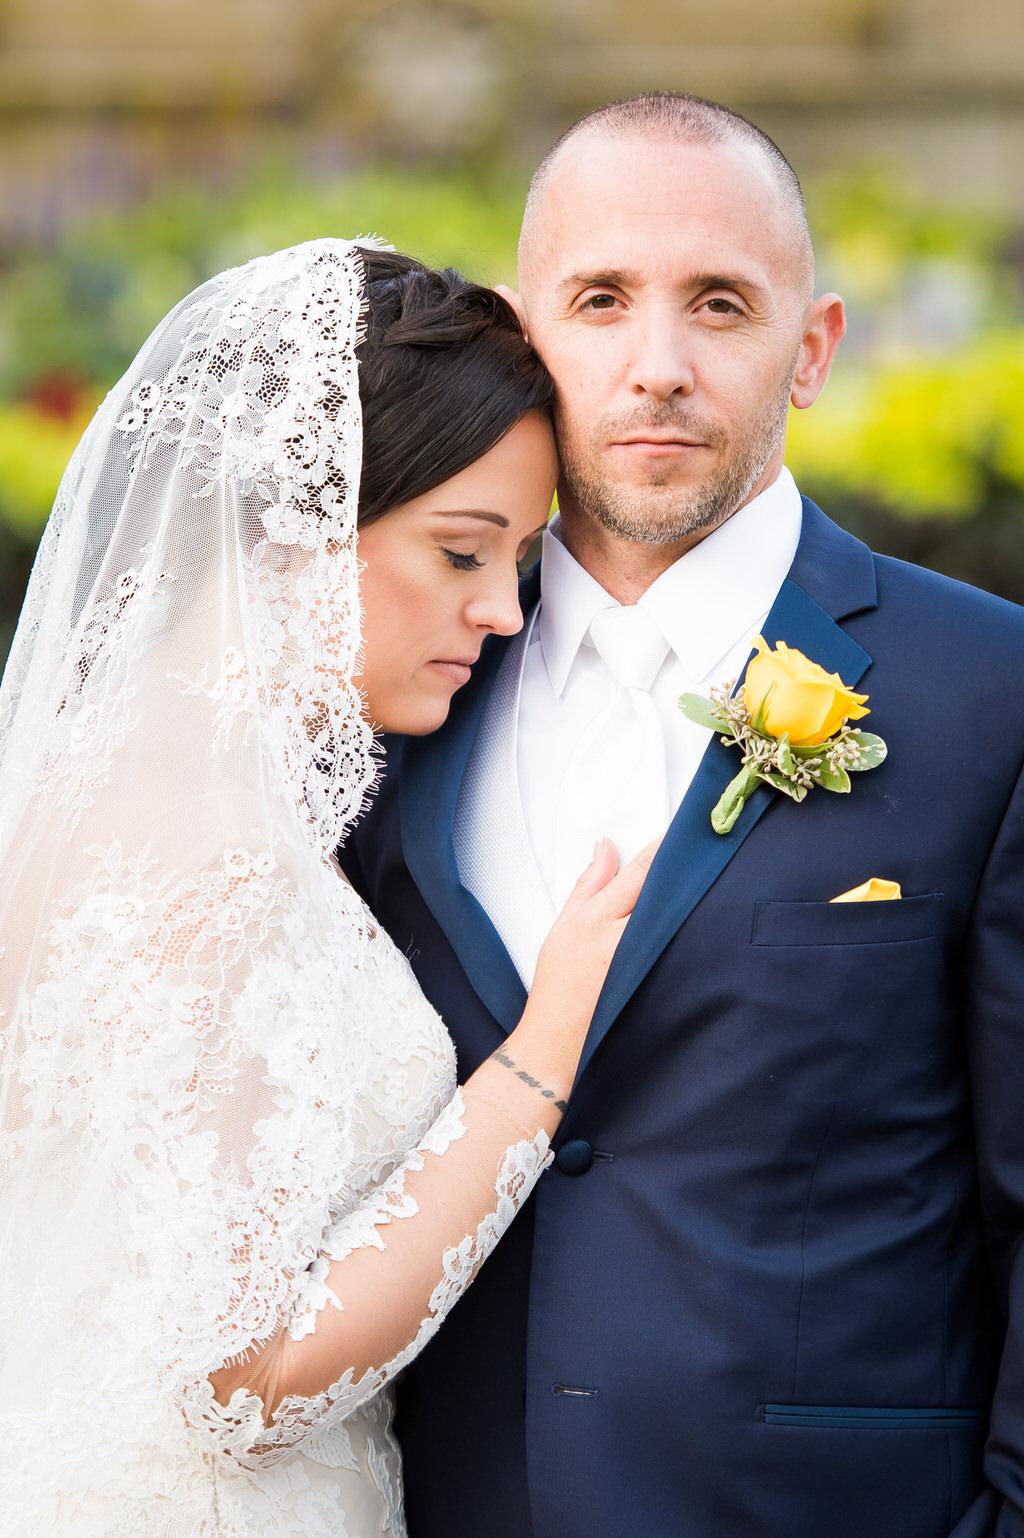 Jannette De Llanos Photography Wedding Photographer